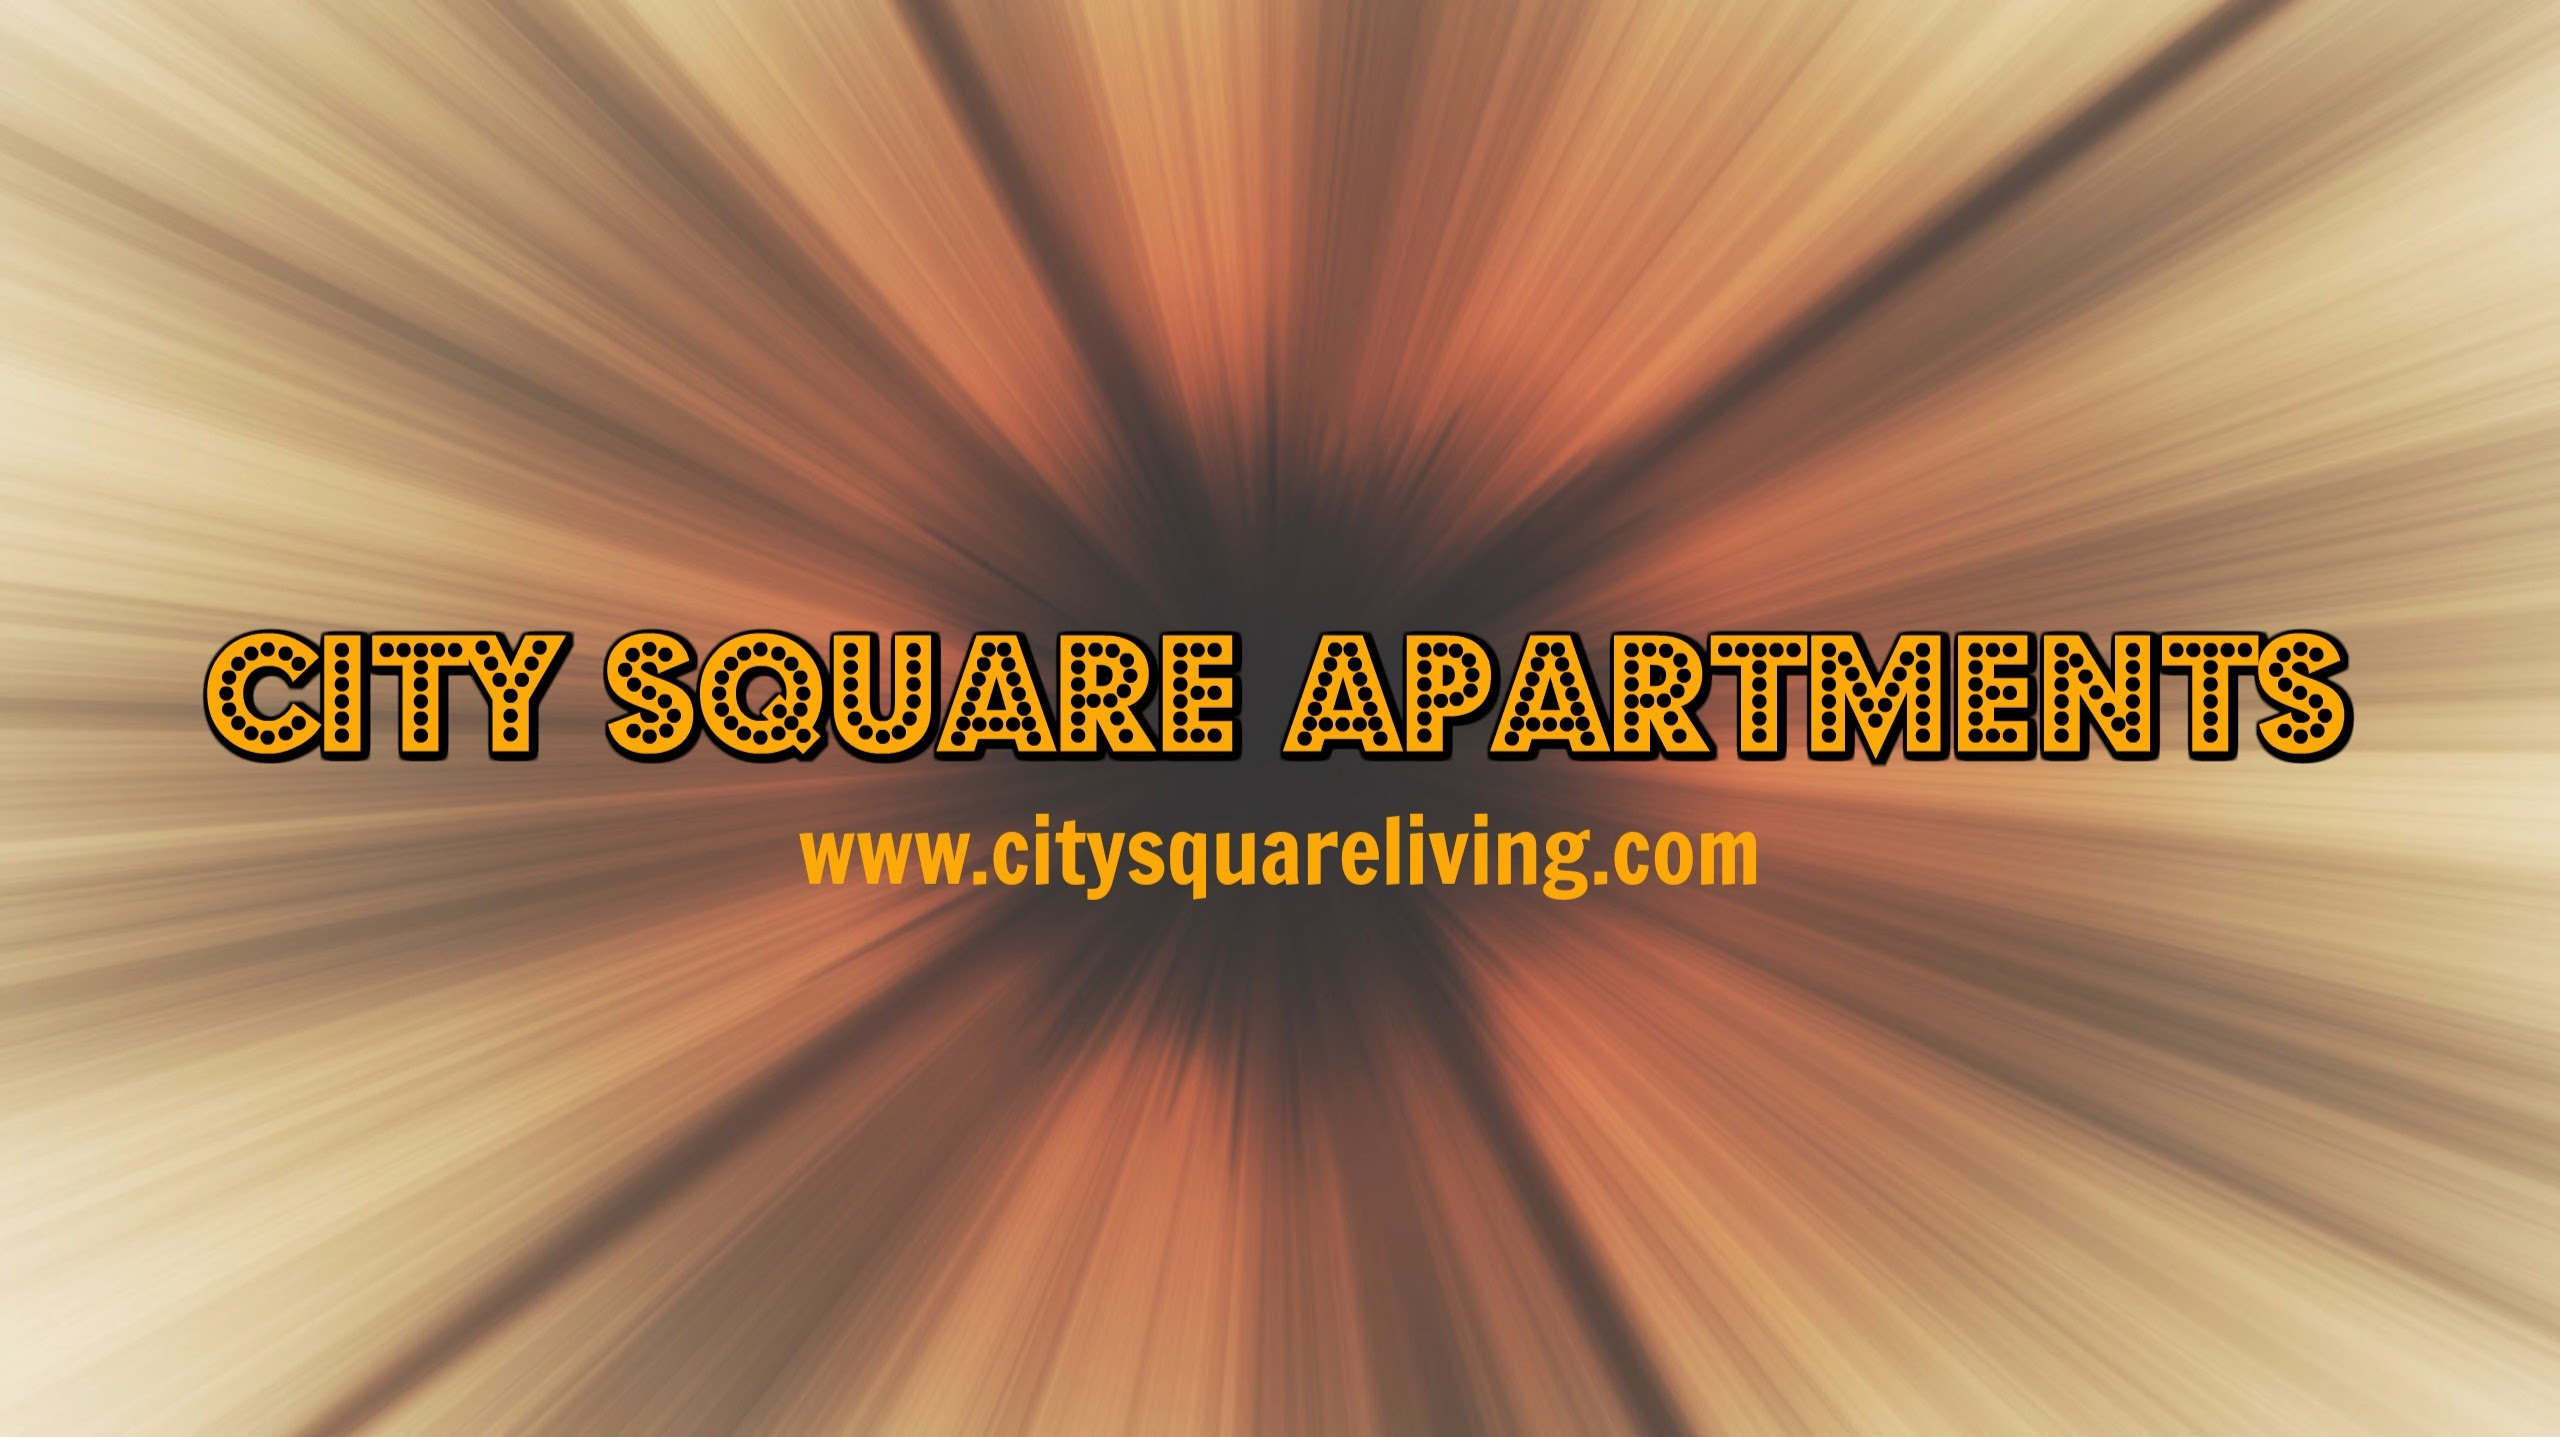 City Square Apartments